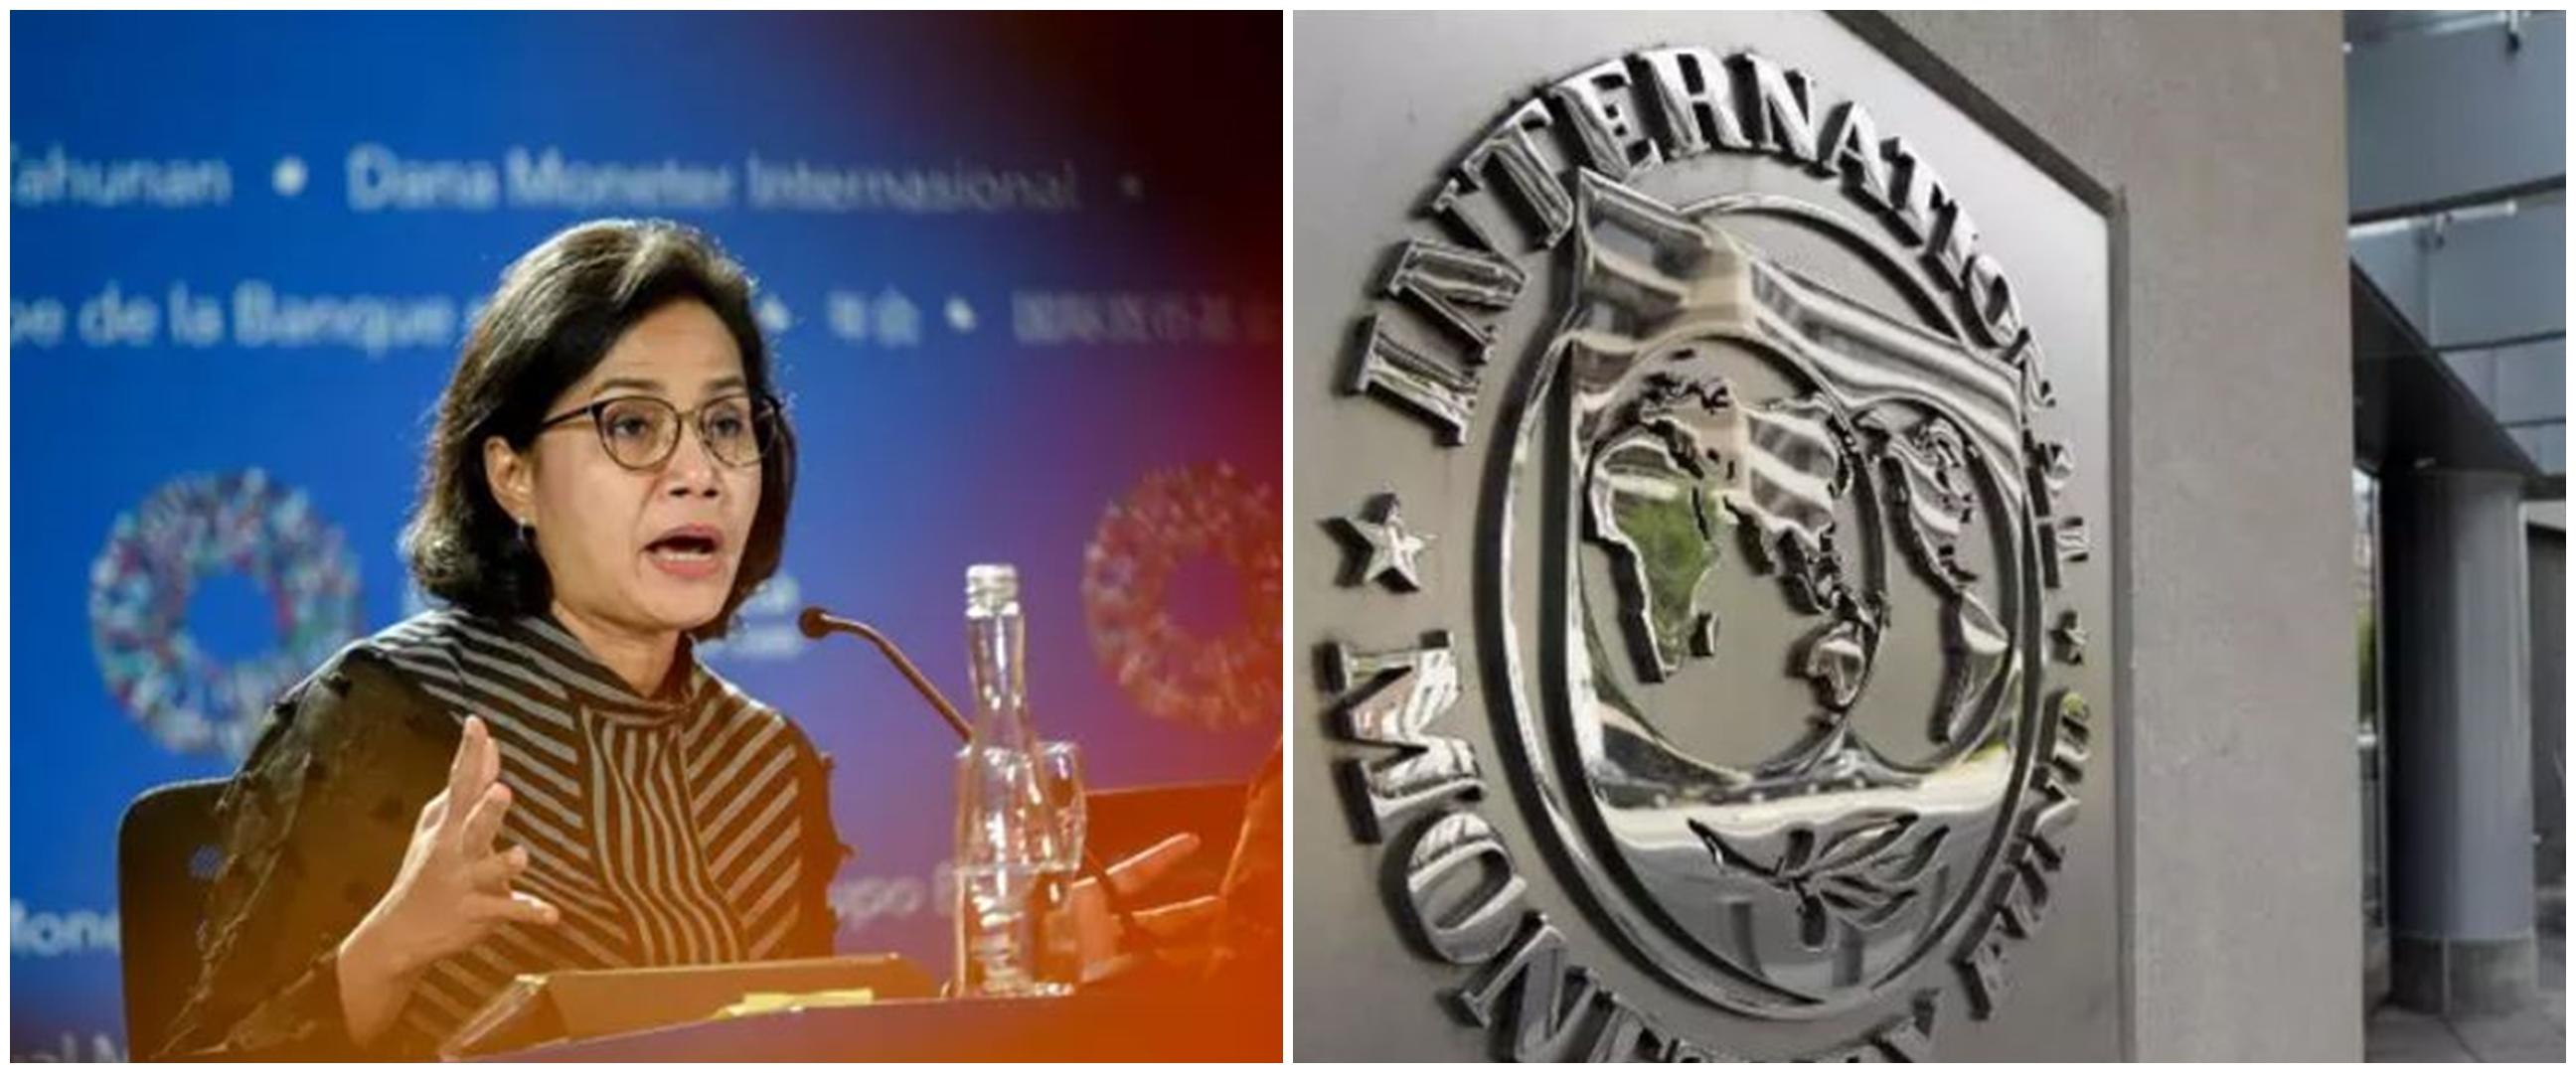 IMF: Hanya 3 negara Asia mampu bertahan hadapi corona, ada Indonesia